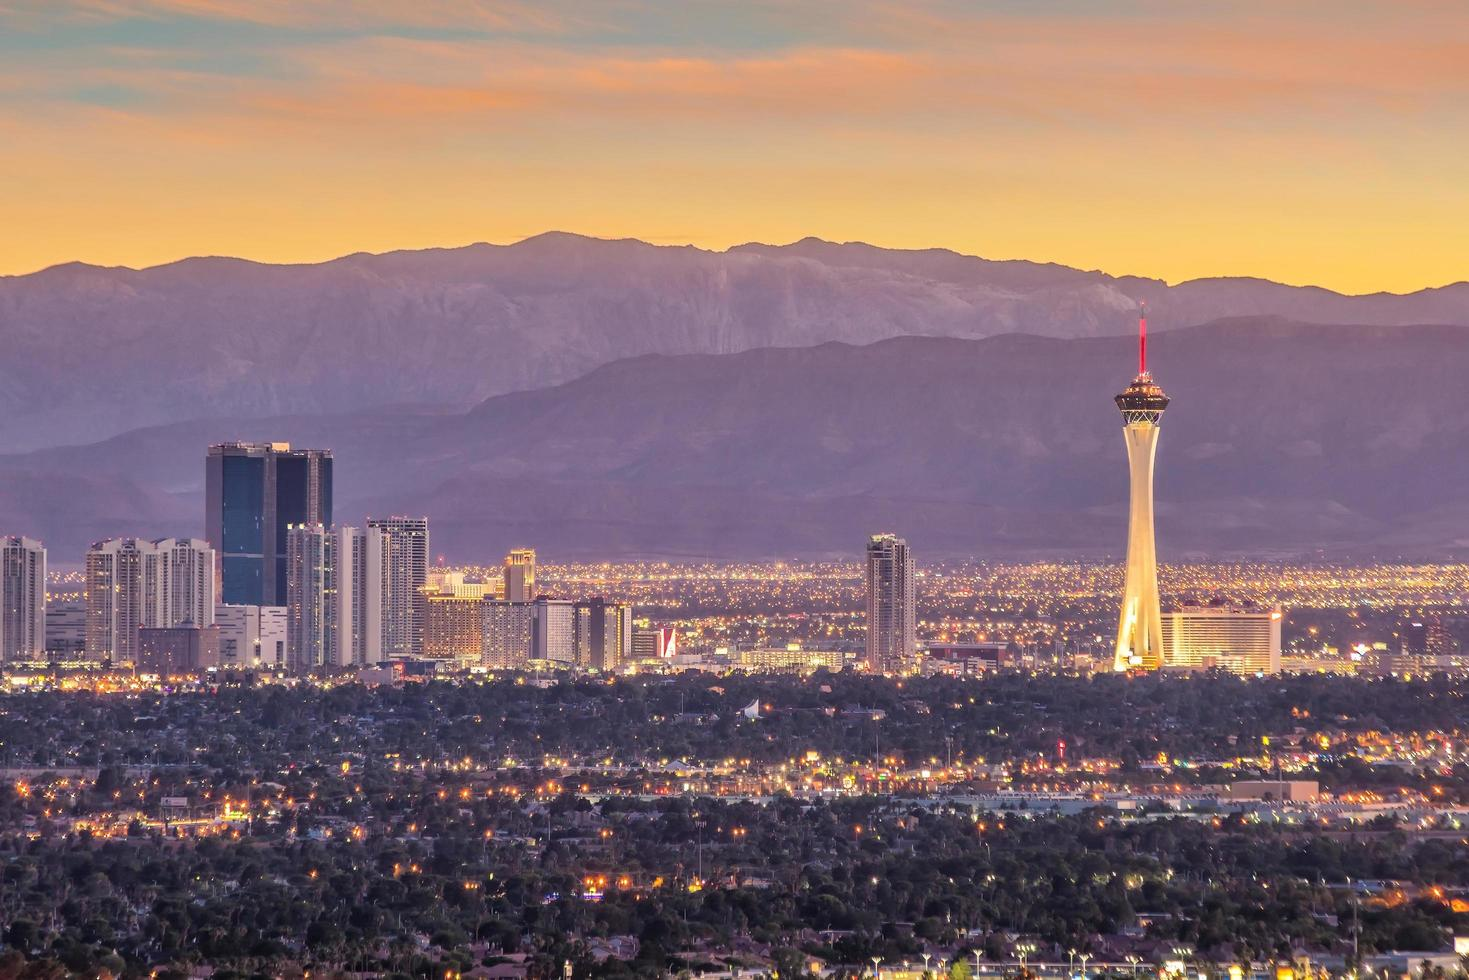 vista panorámica del paisaje urbano de las vegas foto